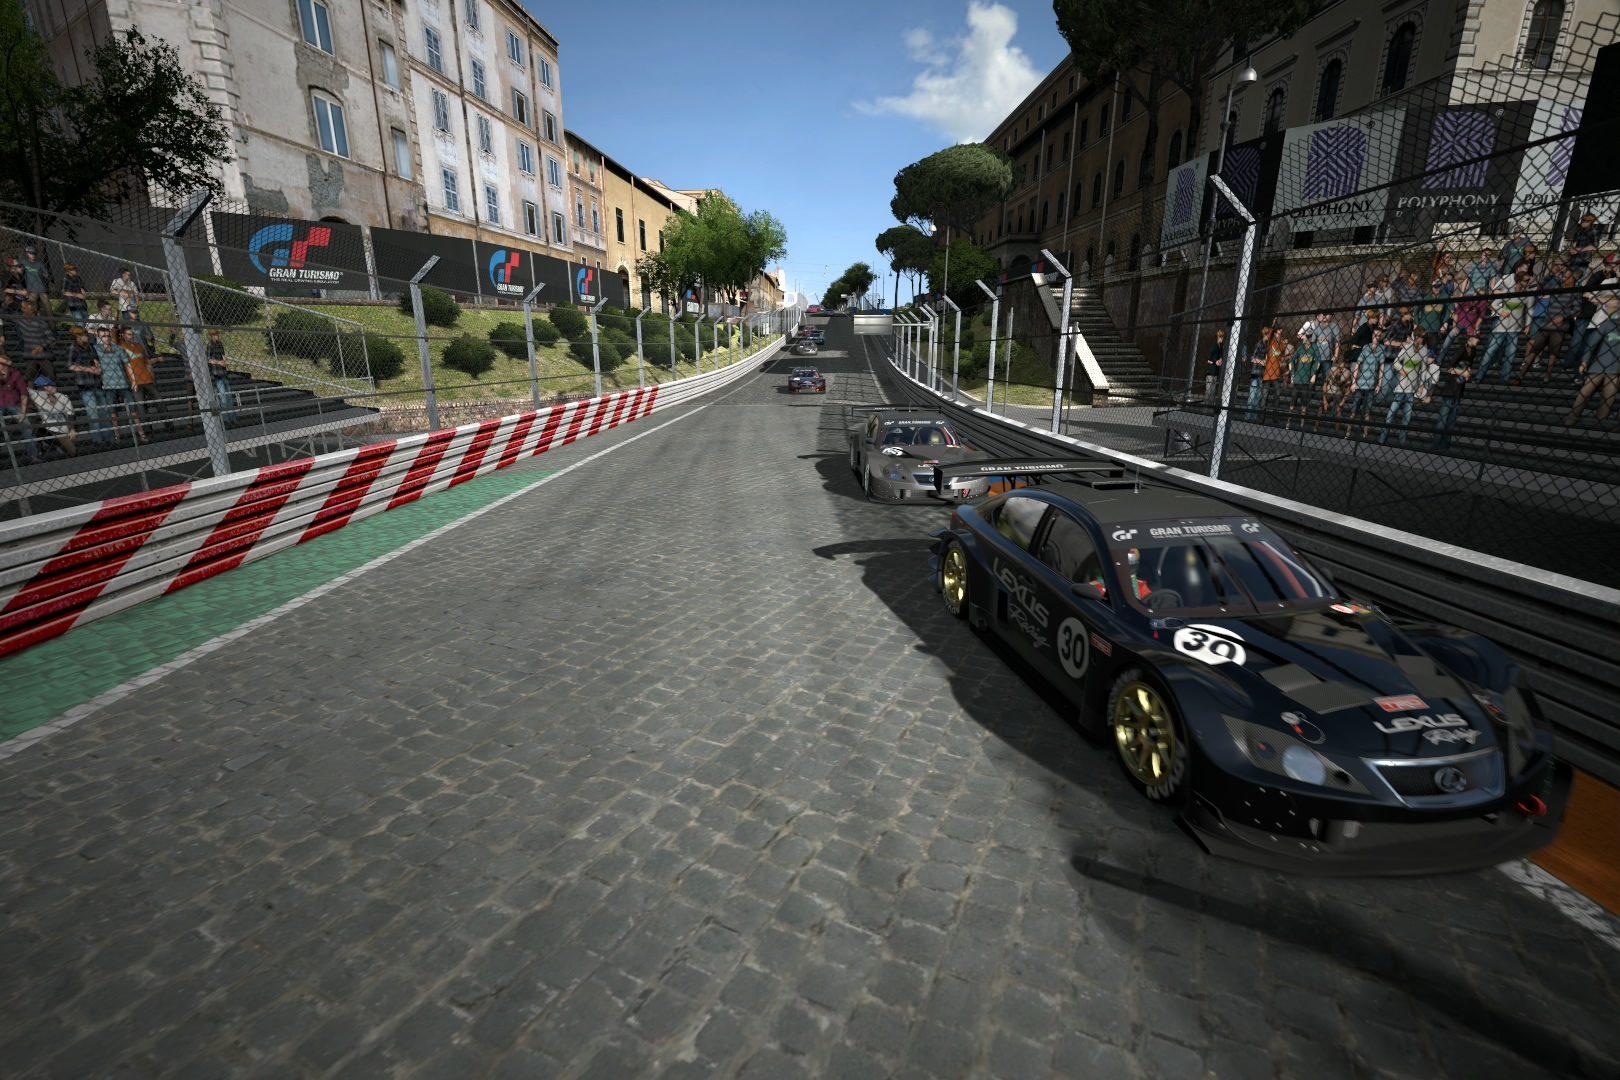 Circuito di Roma_11.jpg